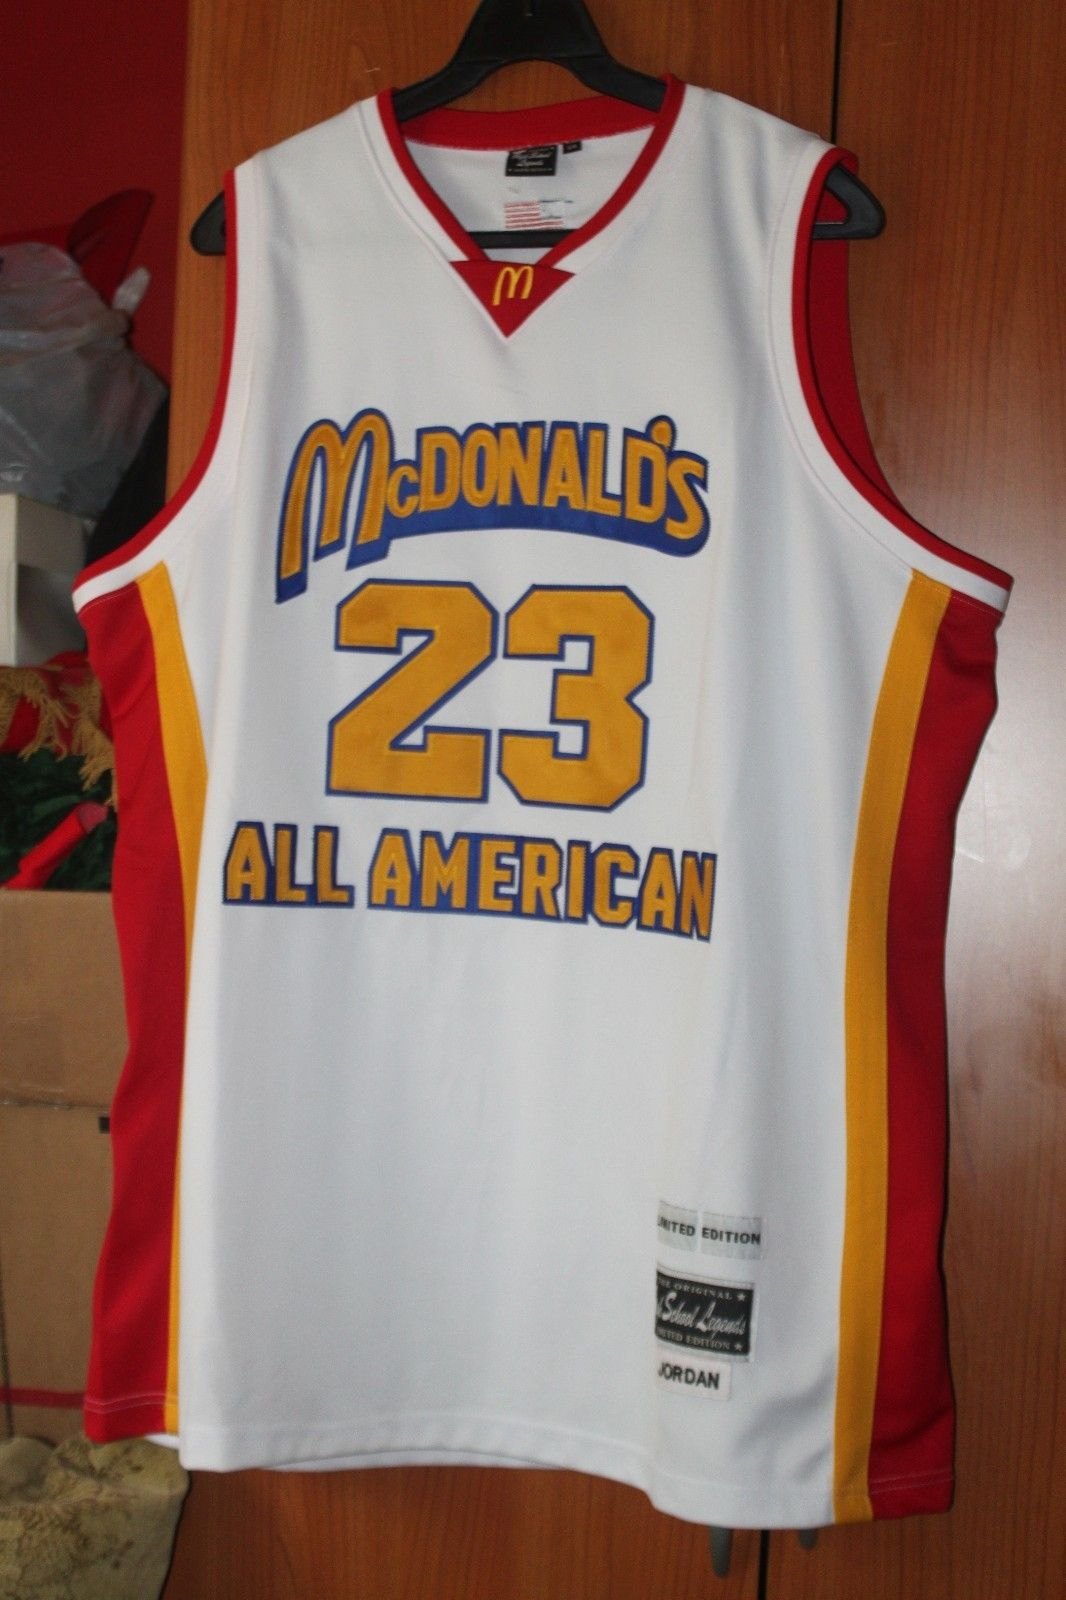 the latest 37dc6 f2ad7 Michael Jordan McDonald's All American Rare Limited Edition ...